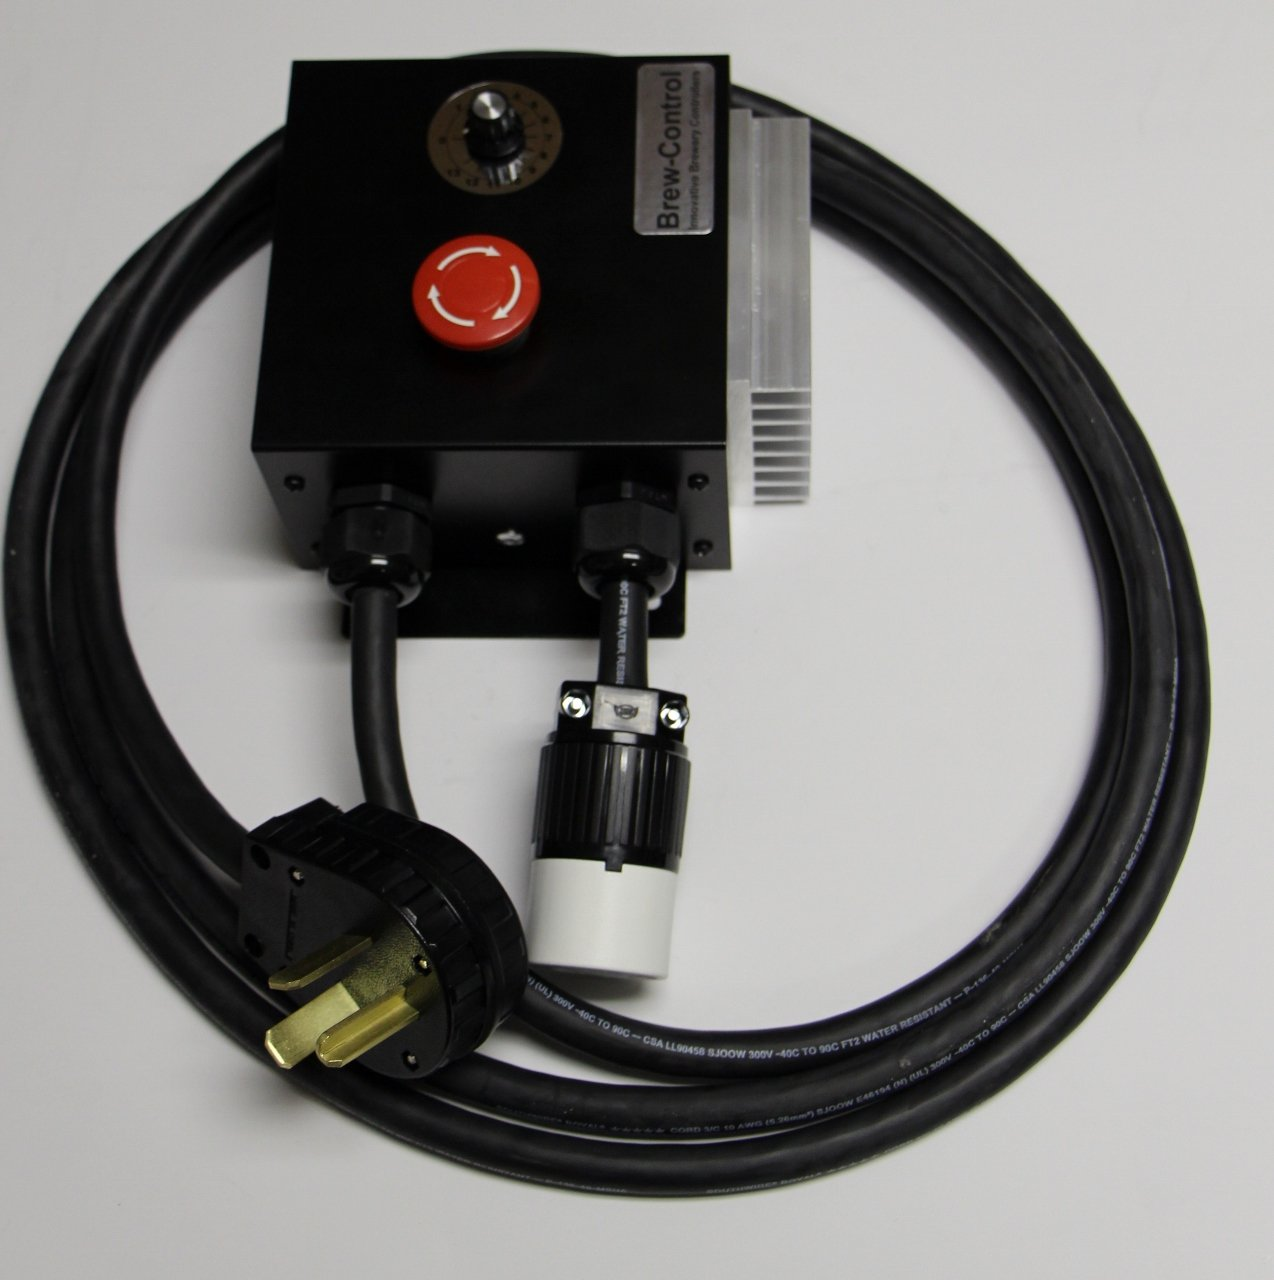 240v Electric Brew Pot / Electric Still Boil Controller by Stir-Plate (Image #6)